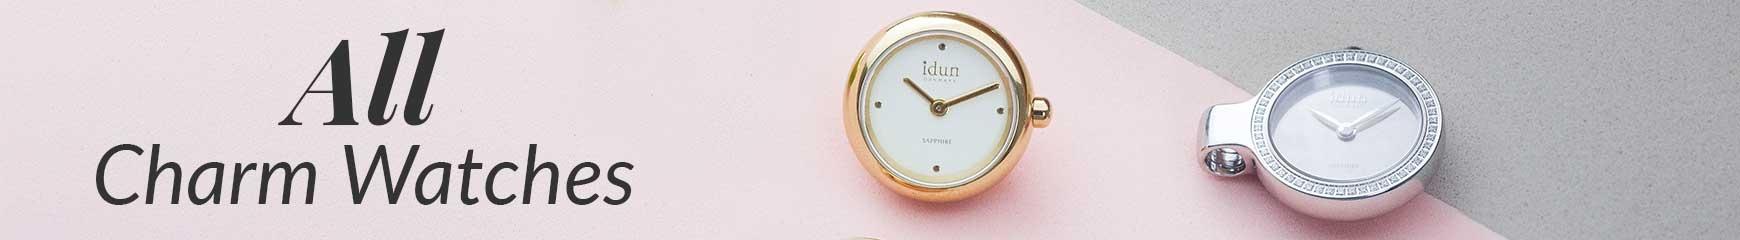 All Idun Charm Watches